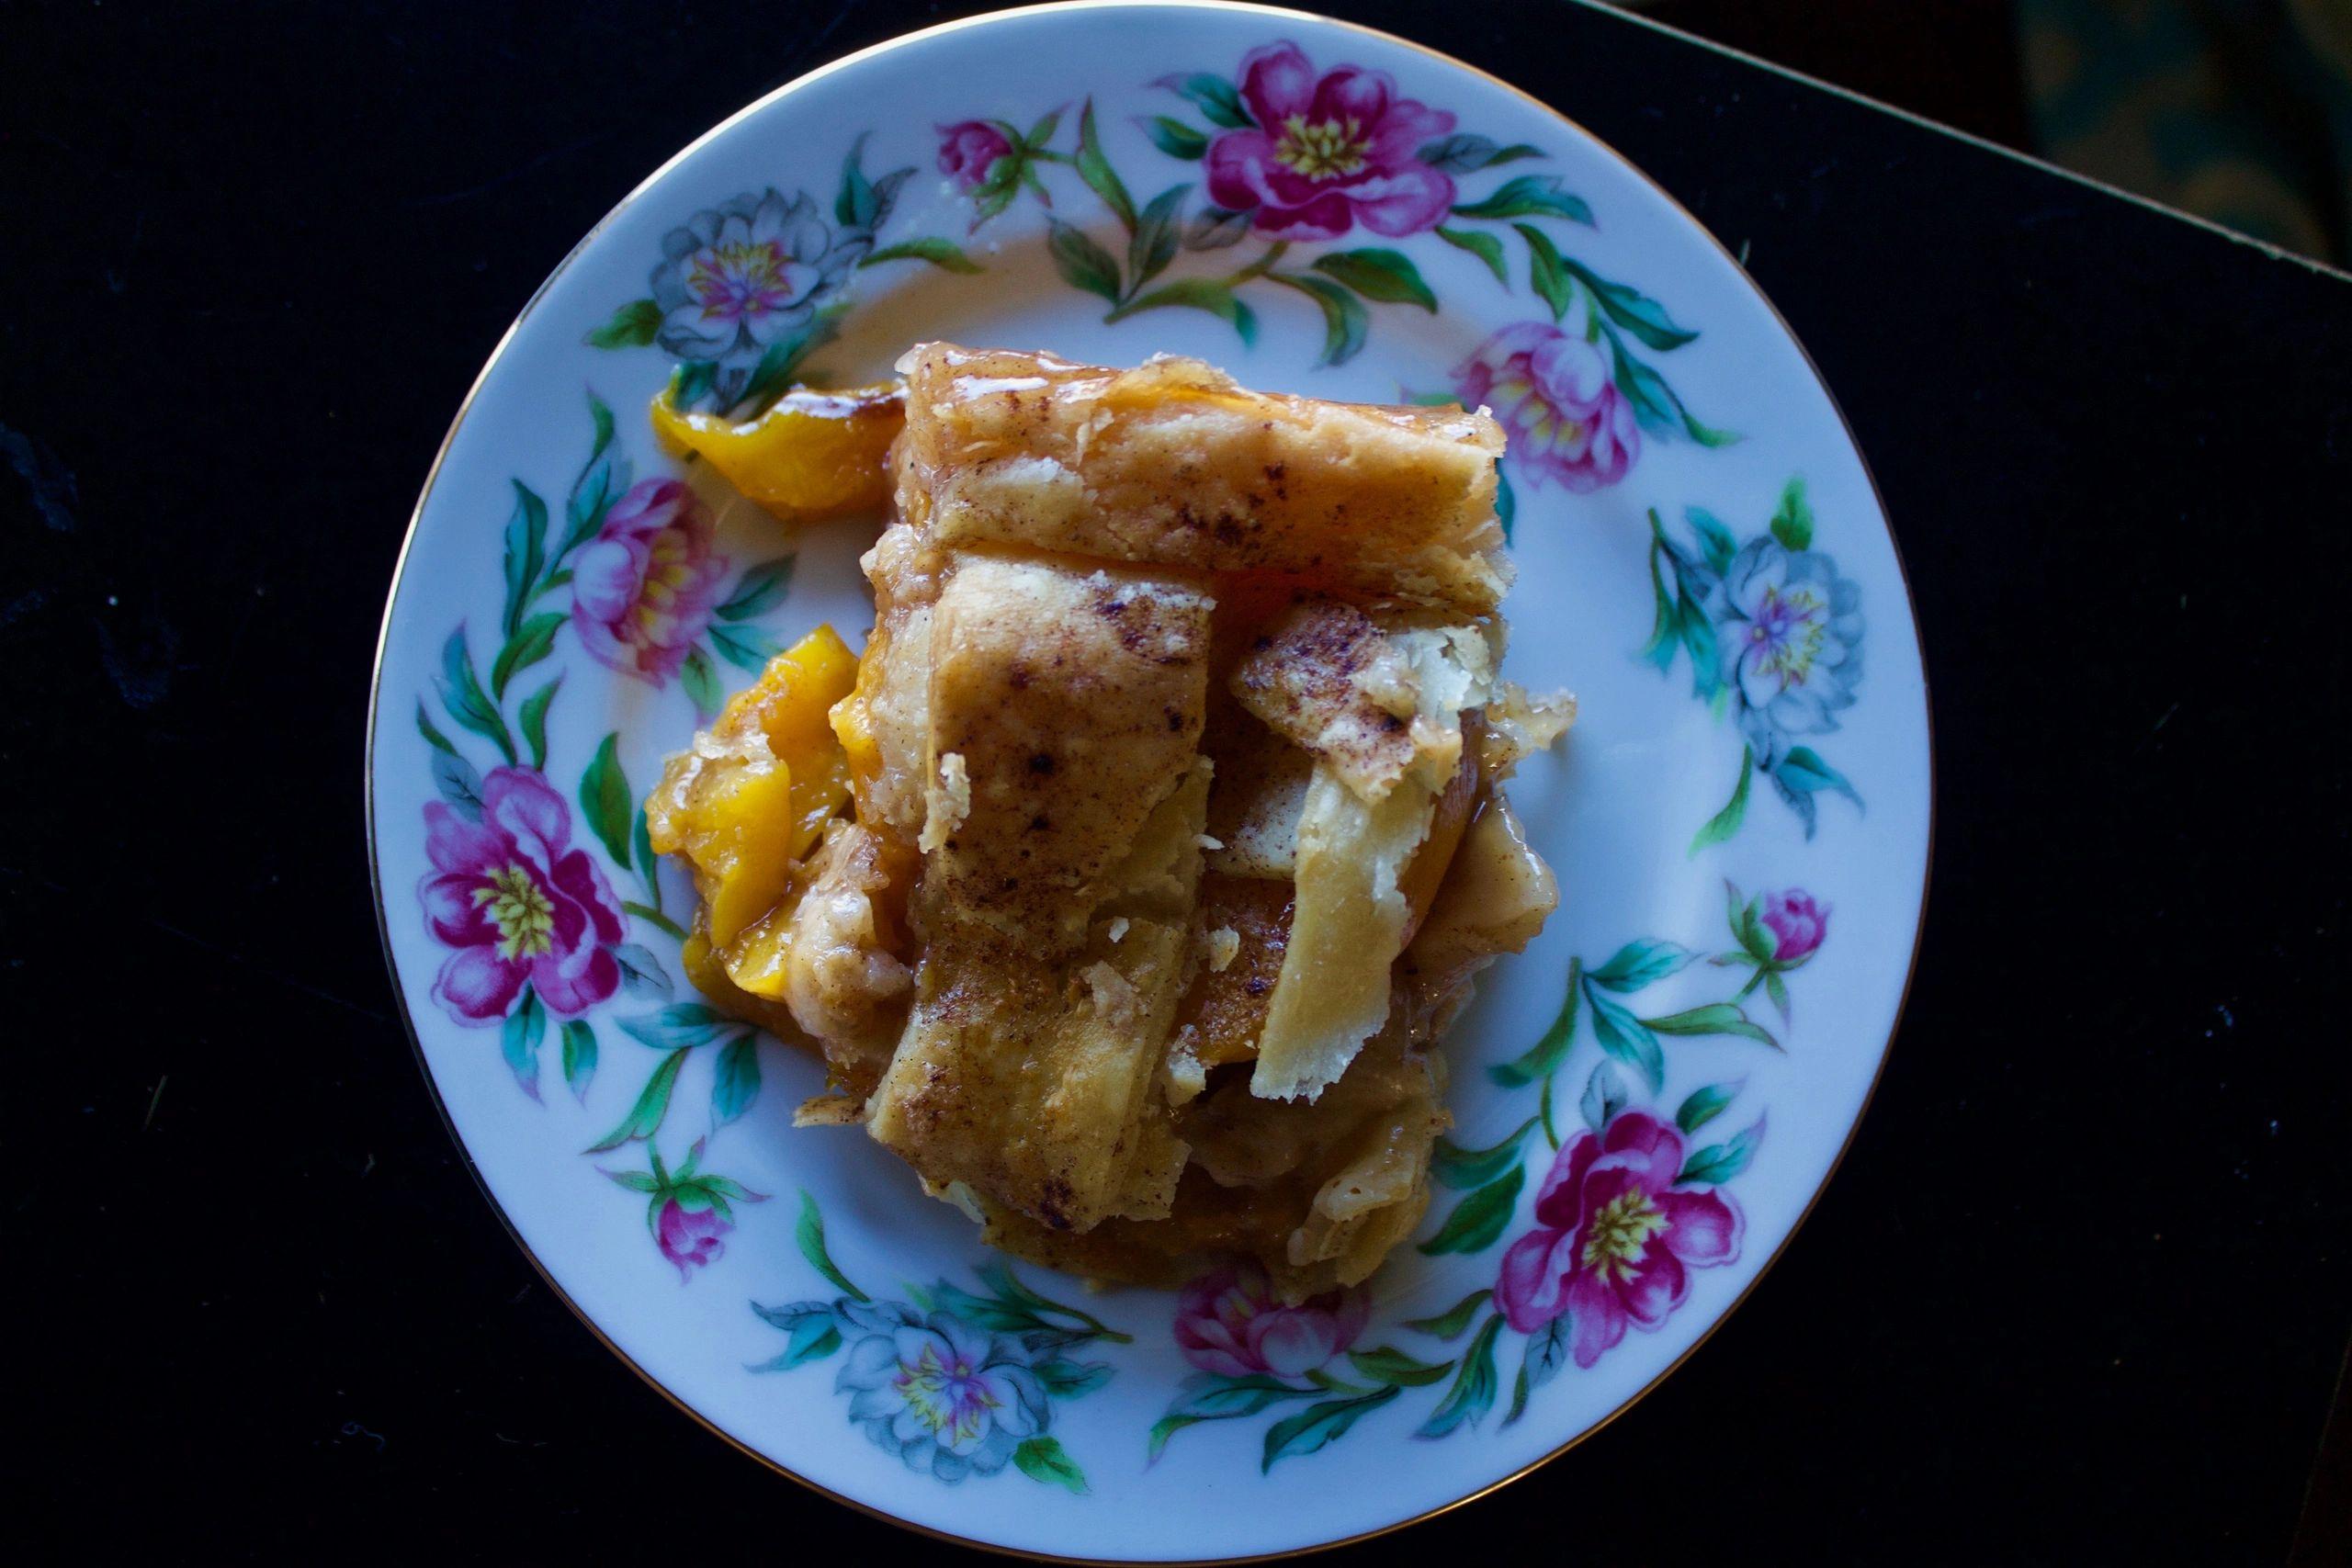 Peach Cobbler on a plate